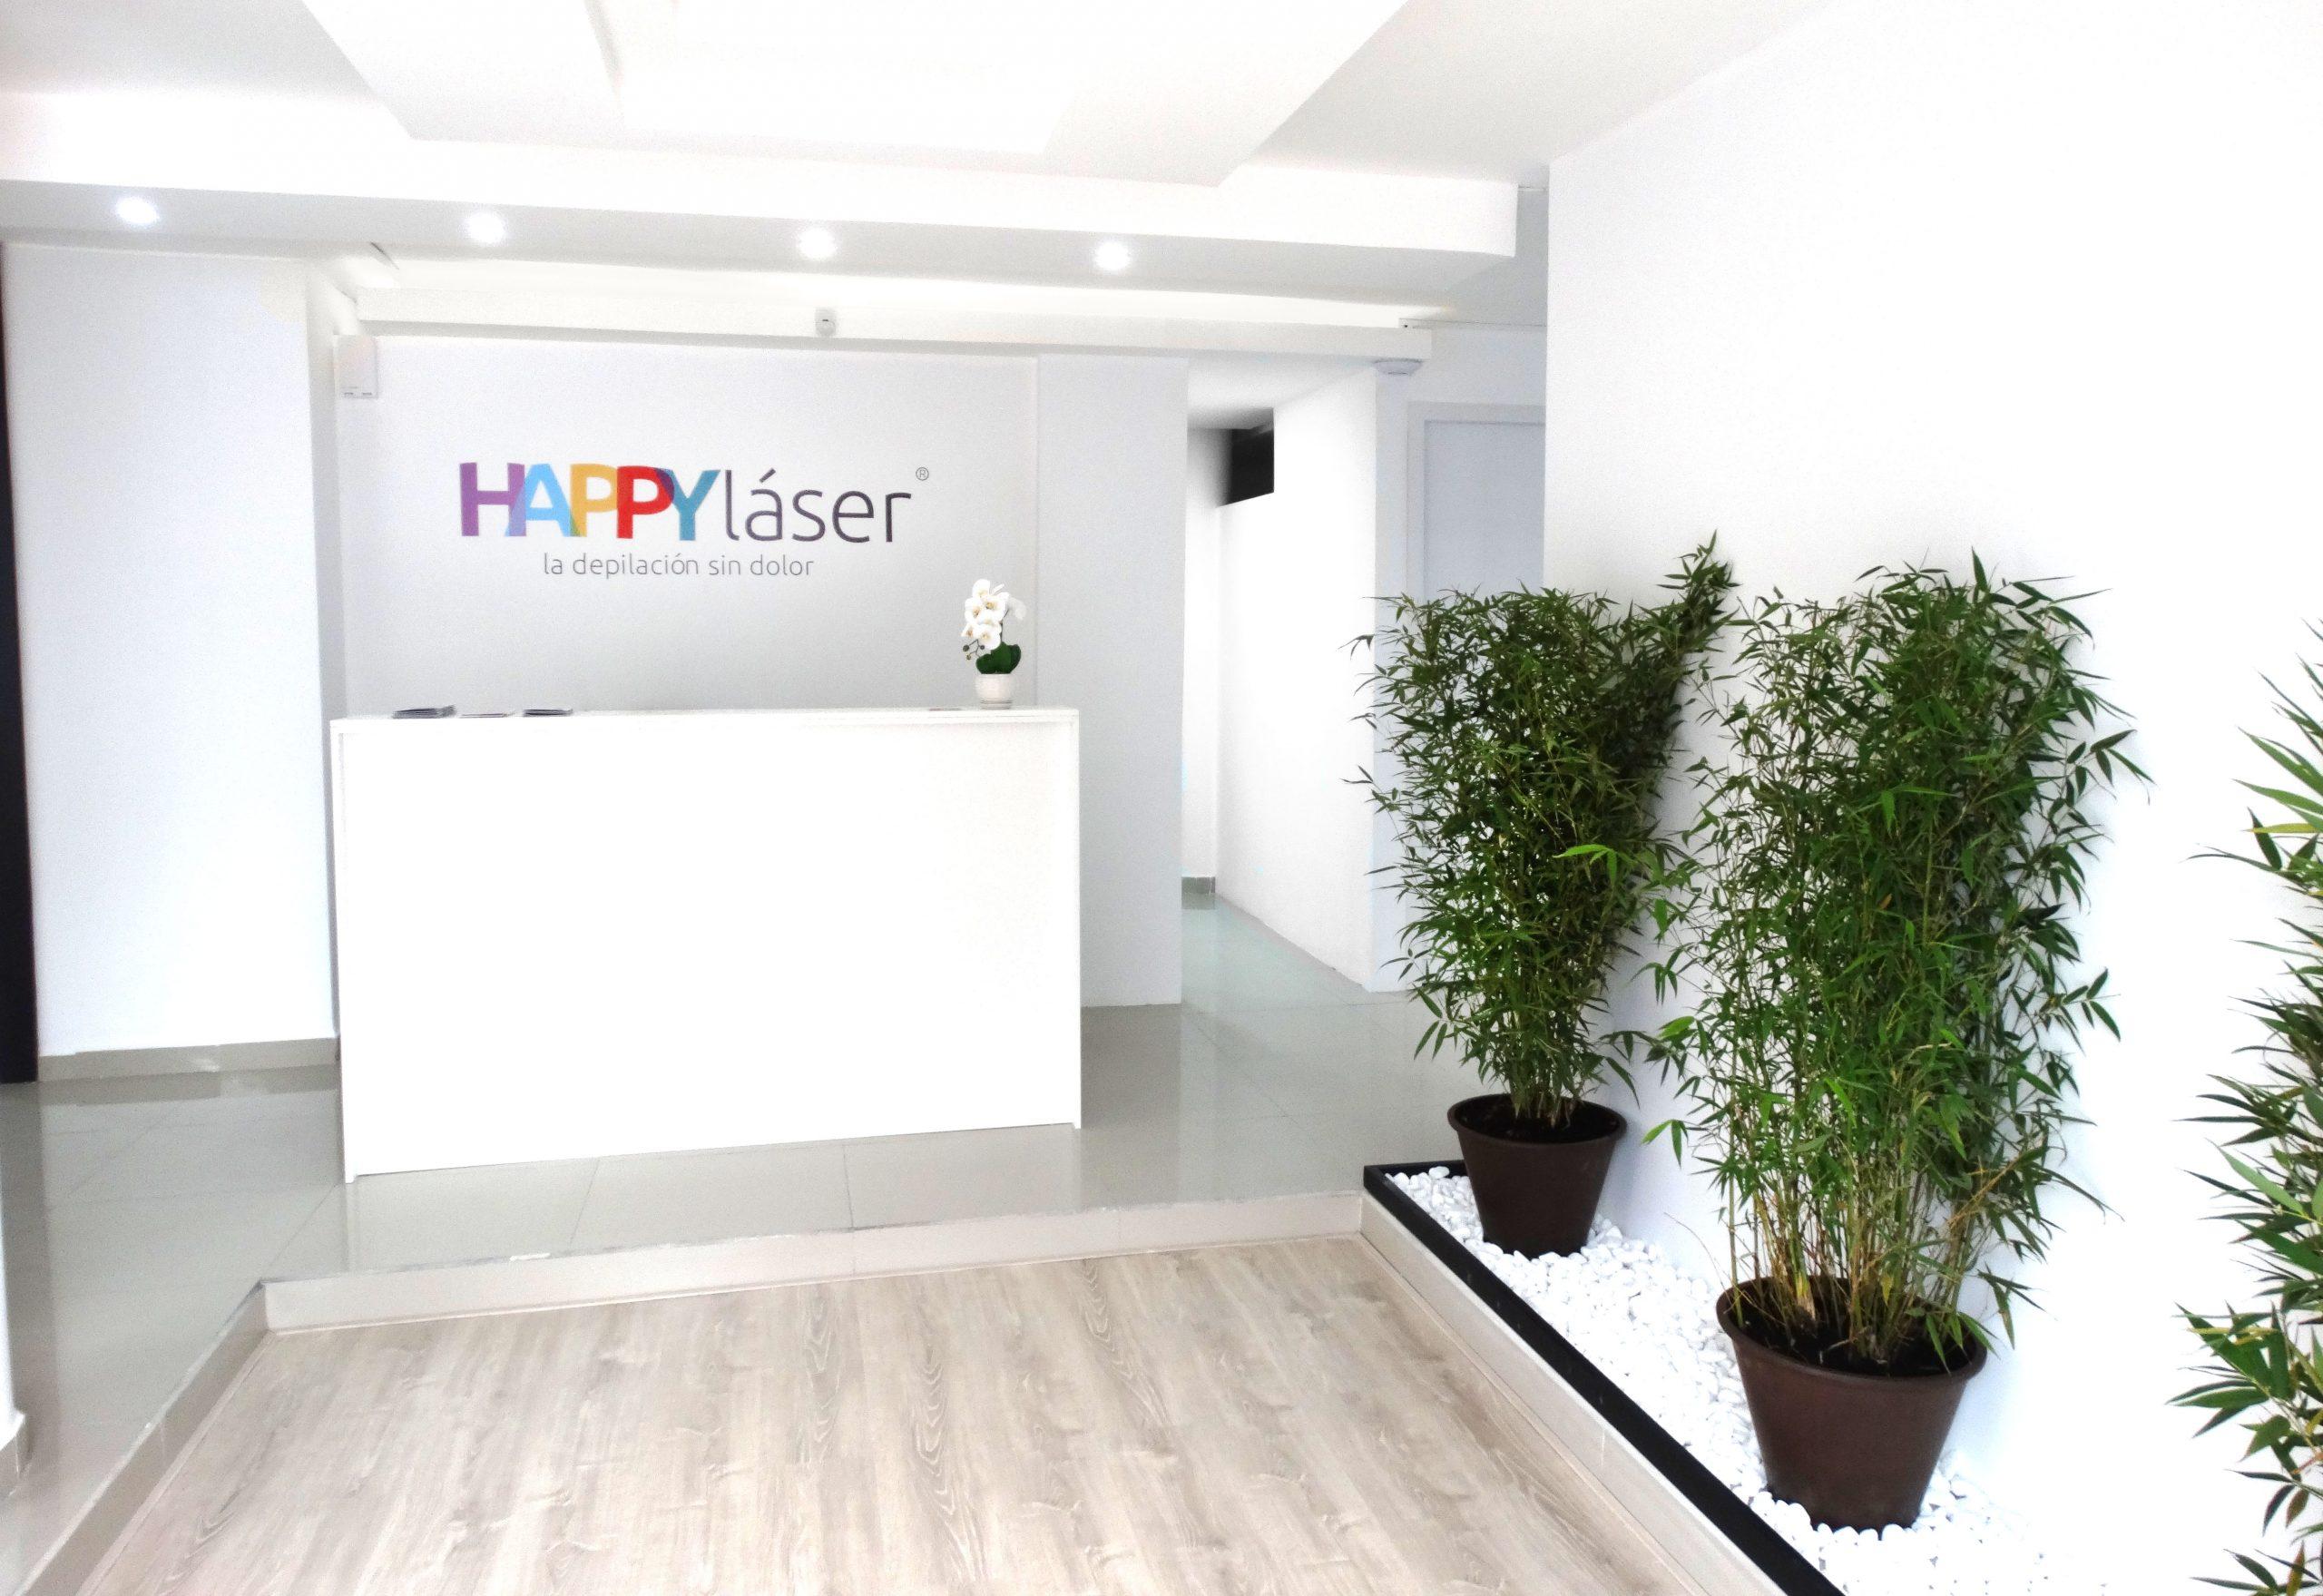 Depilación láser quito - hapylaser (1)